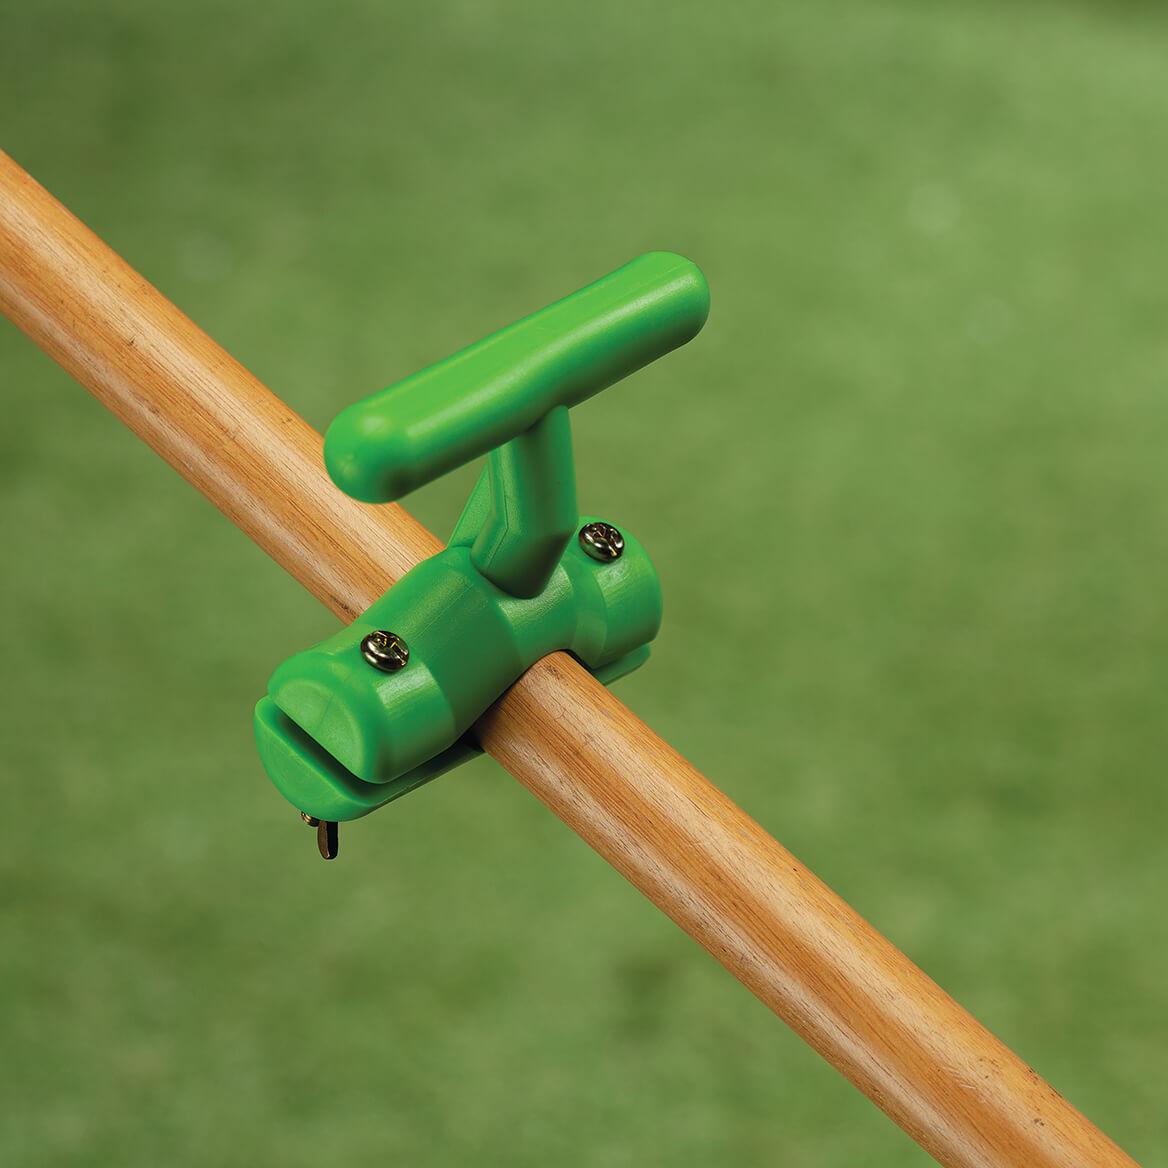 Easy Garden Tool Grip Handle Attachment-370319